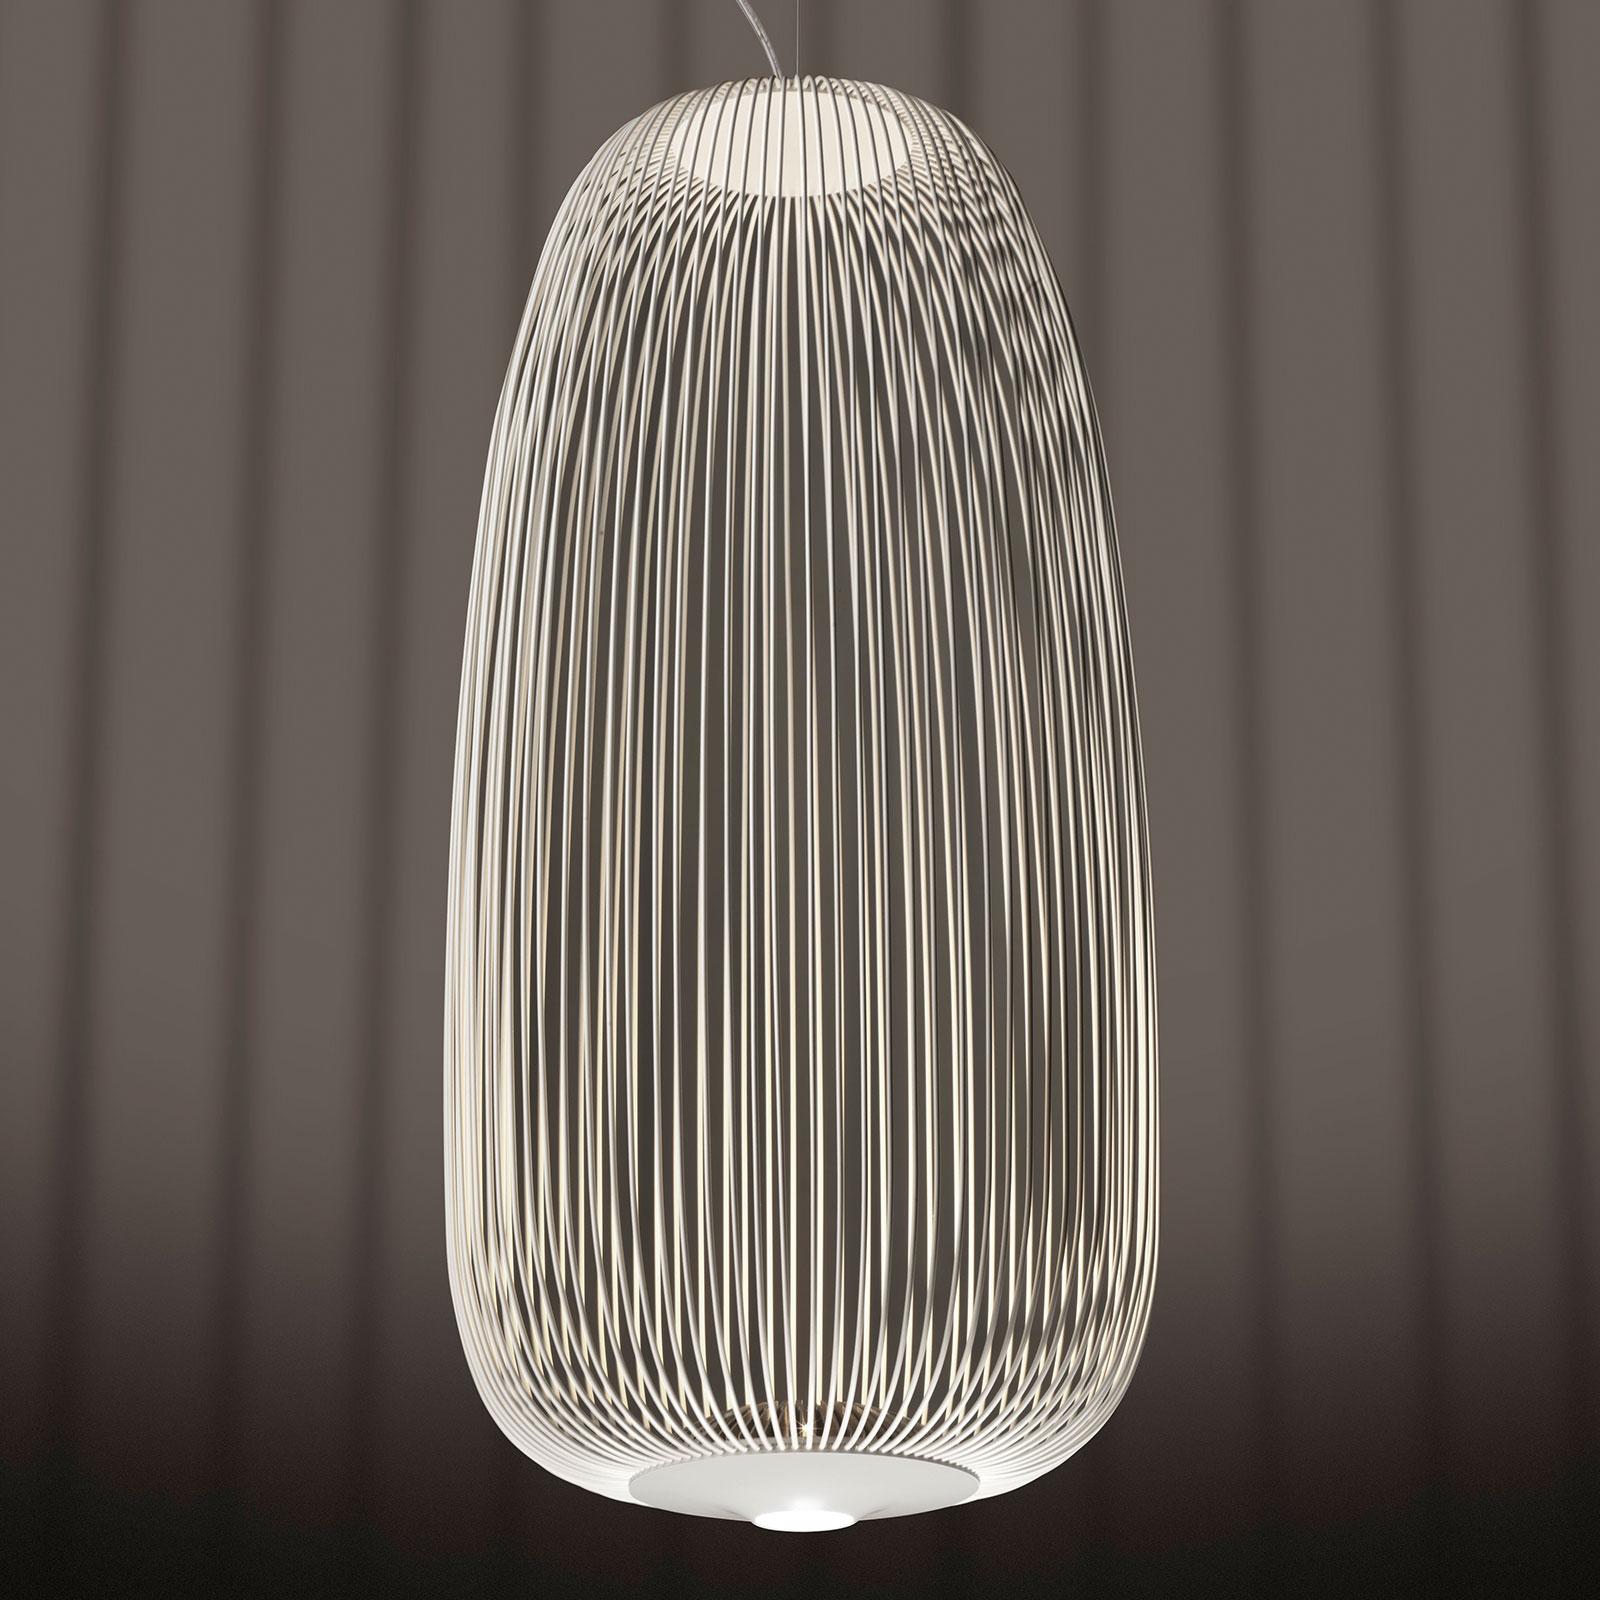 Foscarini Spokes 1 LED-pendellampe dimbar hvit